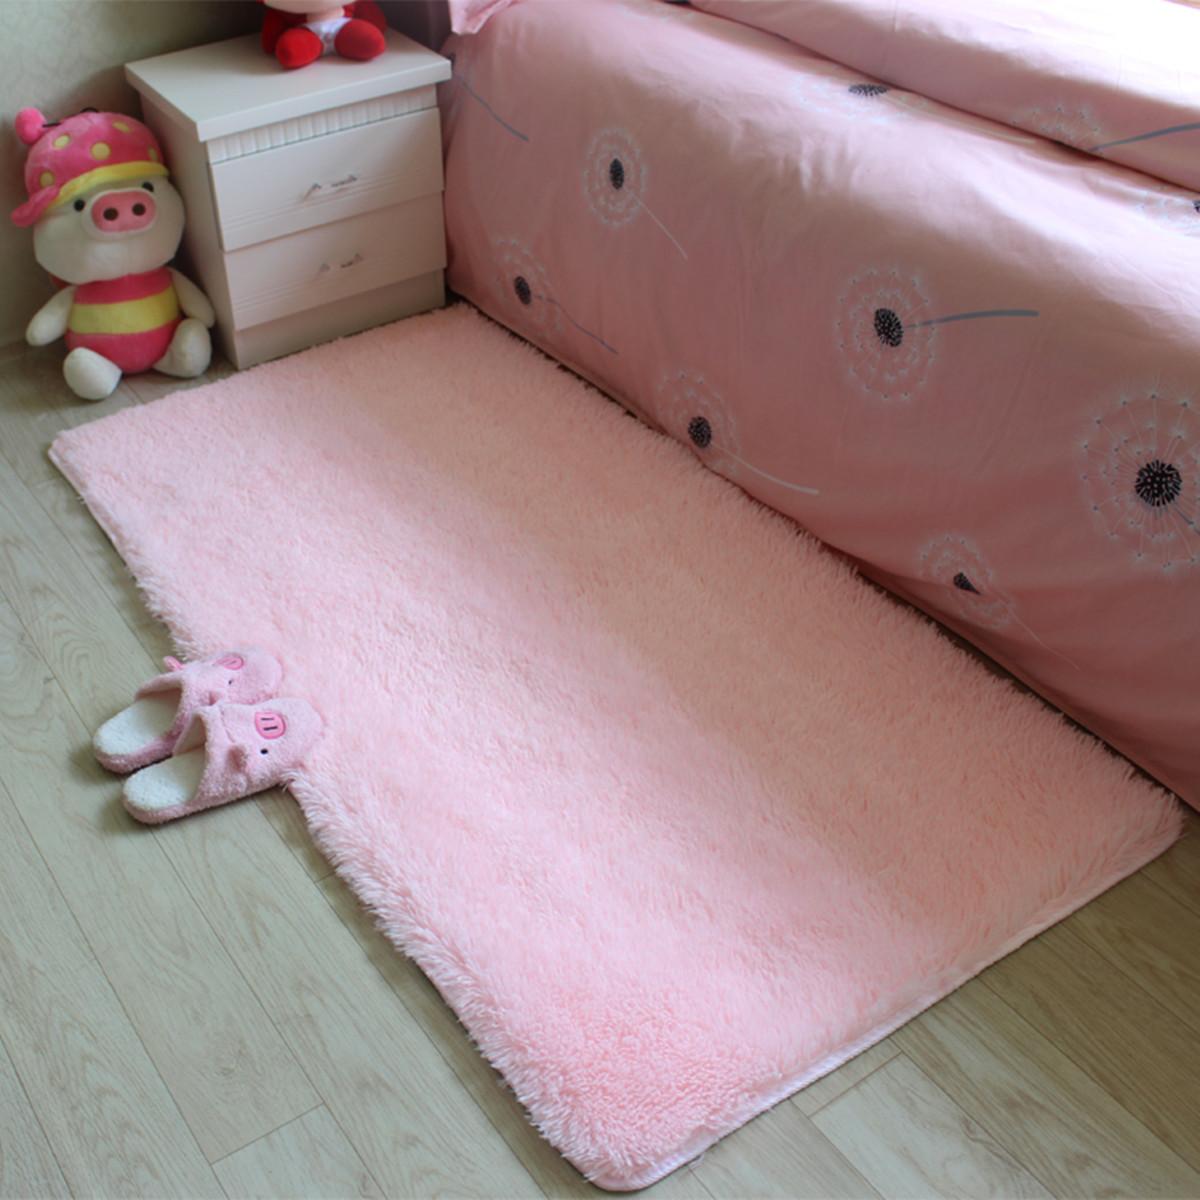 ❤ 60x120cm ❤ Anti-skid Shaggy Area Rug Dining Room Carpet Fluffy Rectangle Floor Rug Yoga Bedroom Floor Mat / Cover Child Play Mat Parlor Bedroom Decor 13 colors